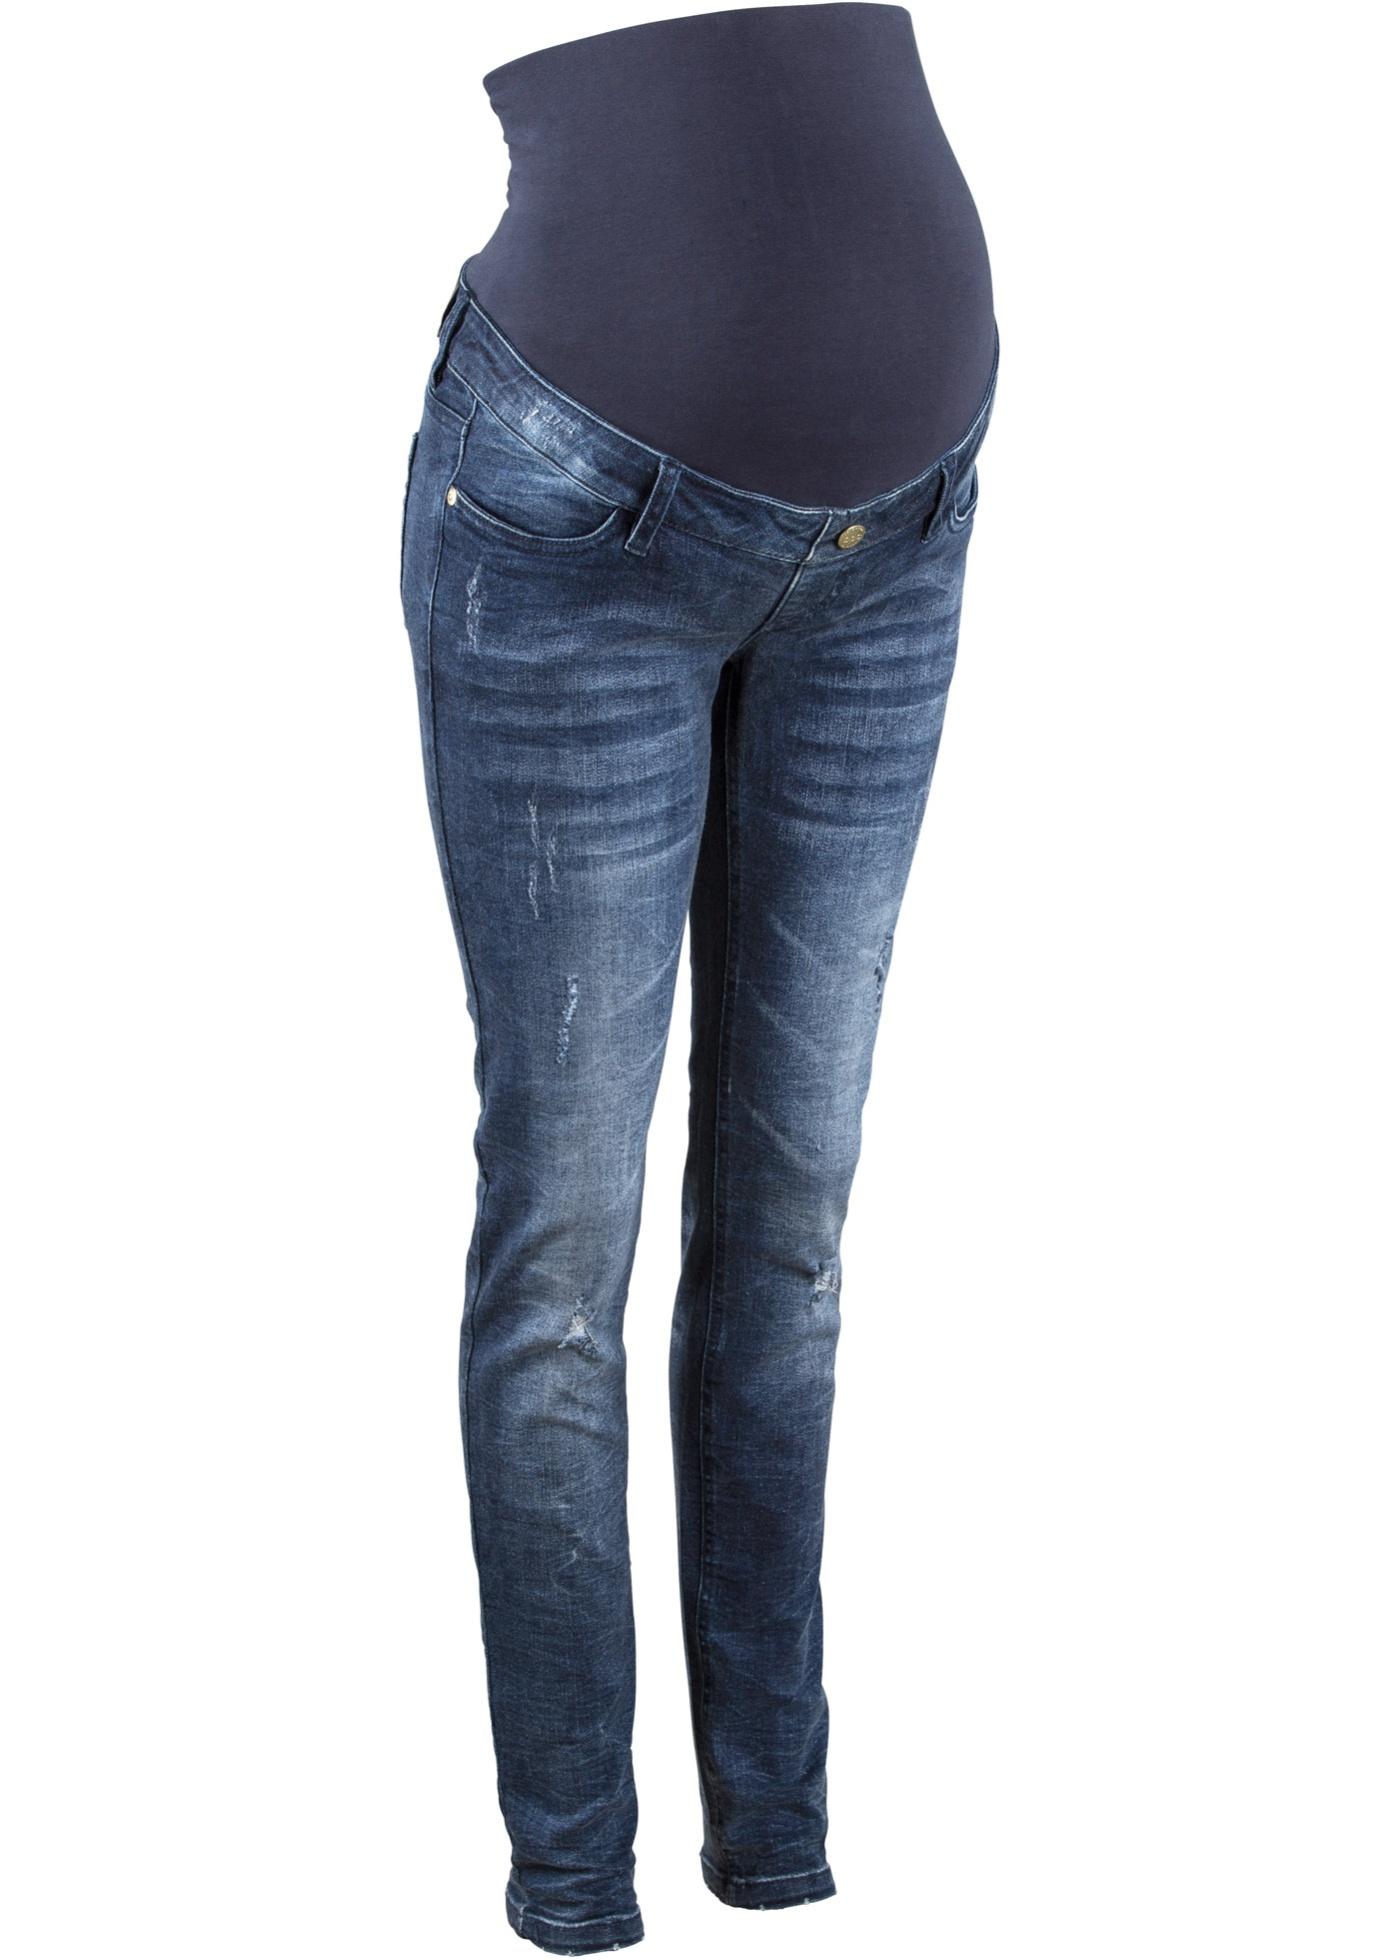 Bonprix Grossesse Bpc Pour Femme Noir Style De DestroyedSkinny CollectionJean Iv7ymbgYf6